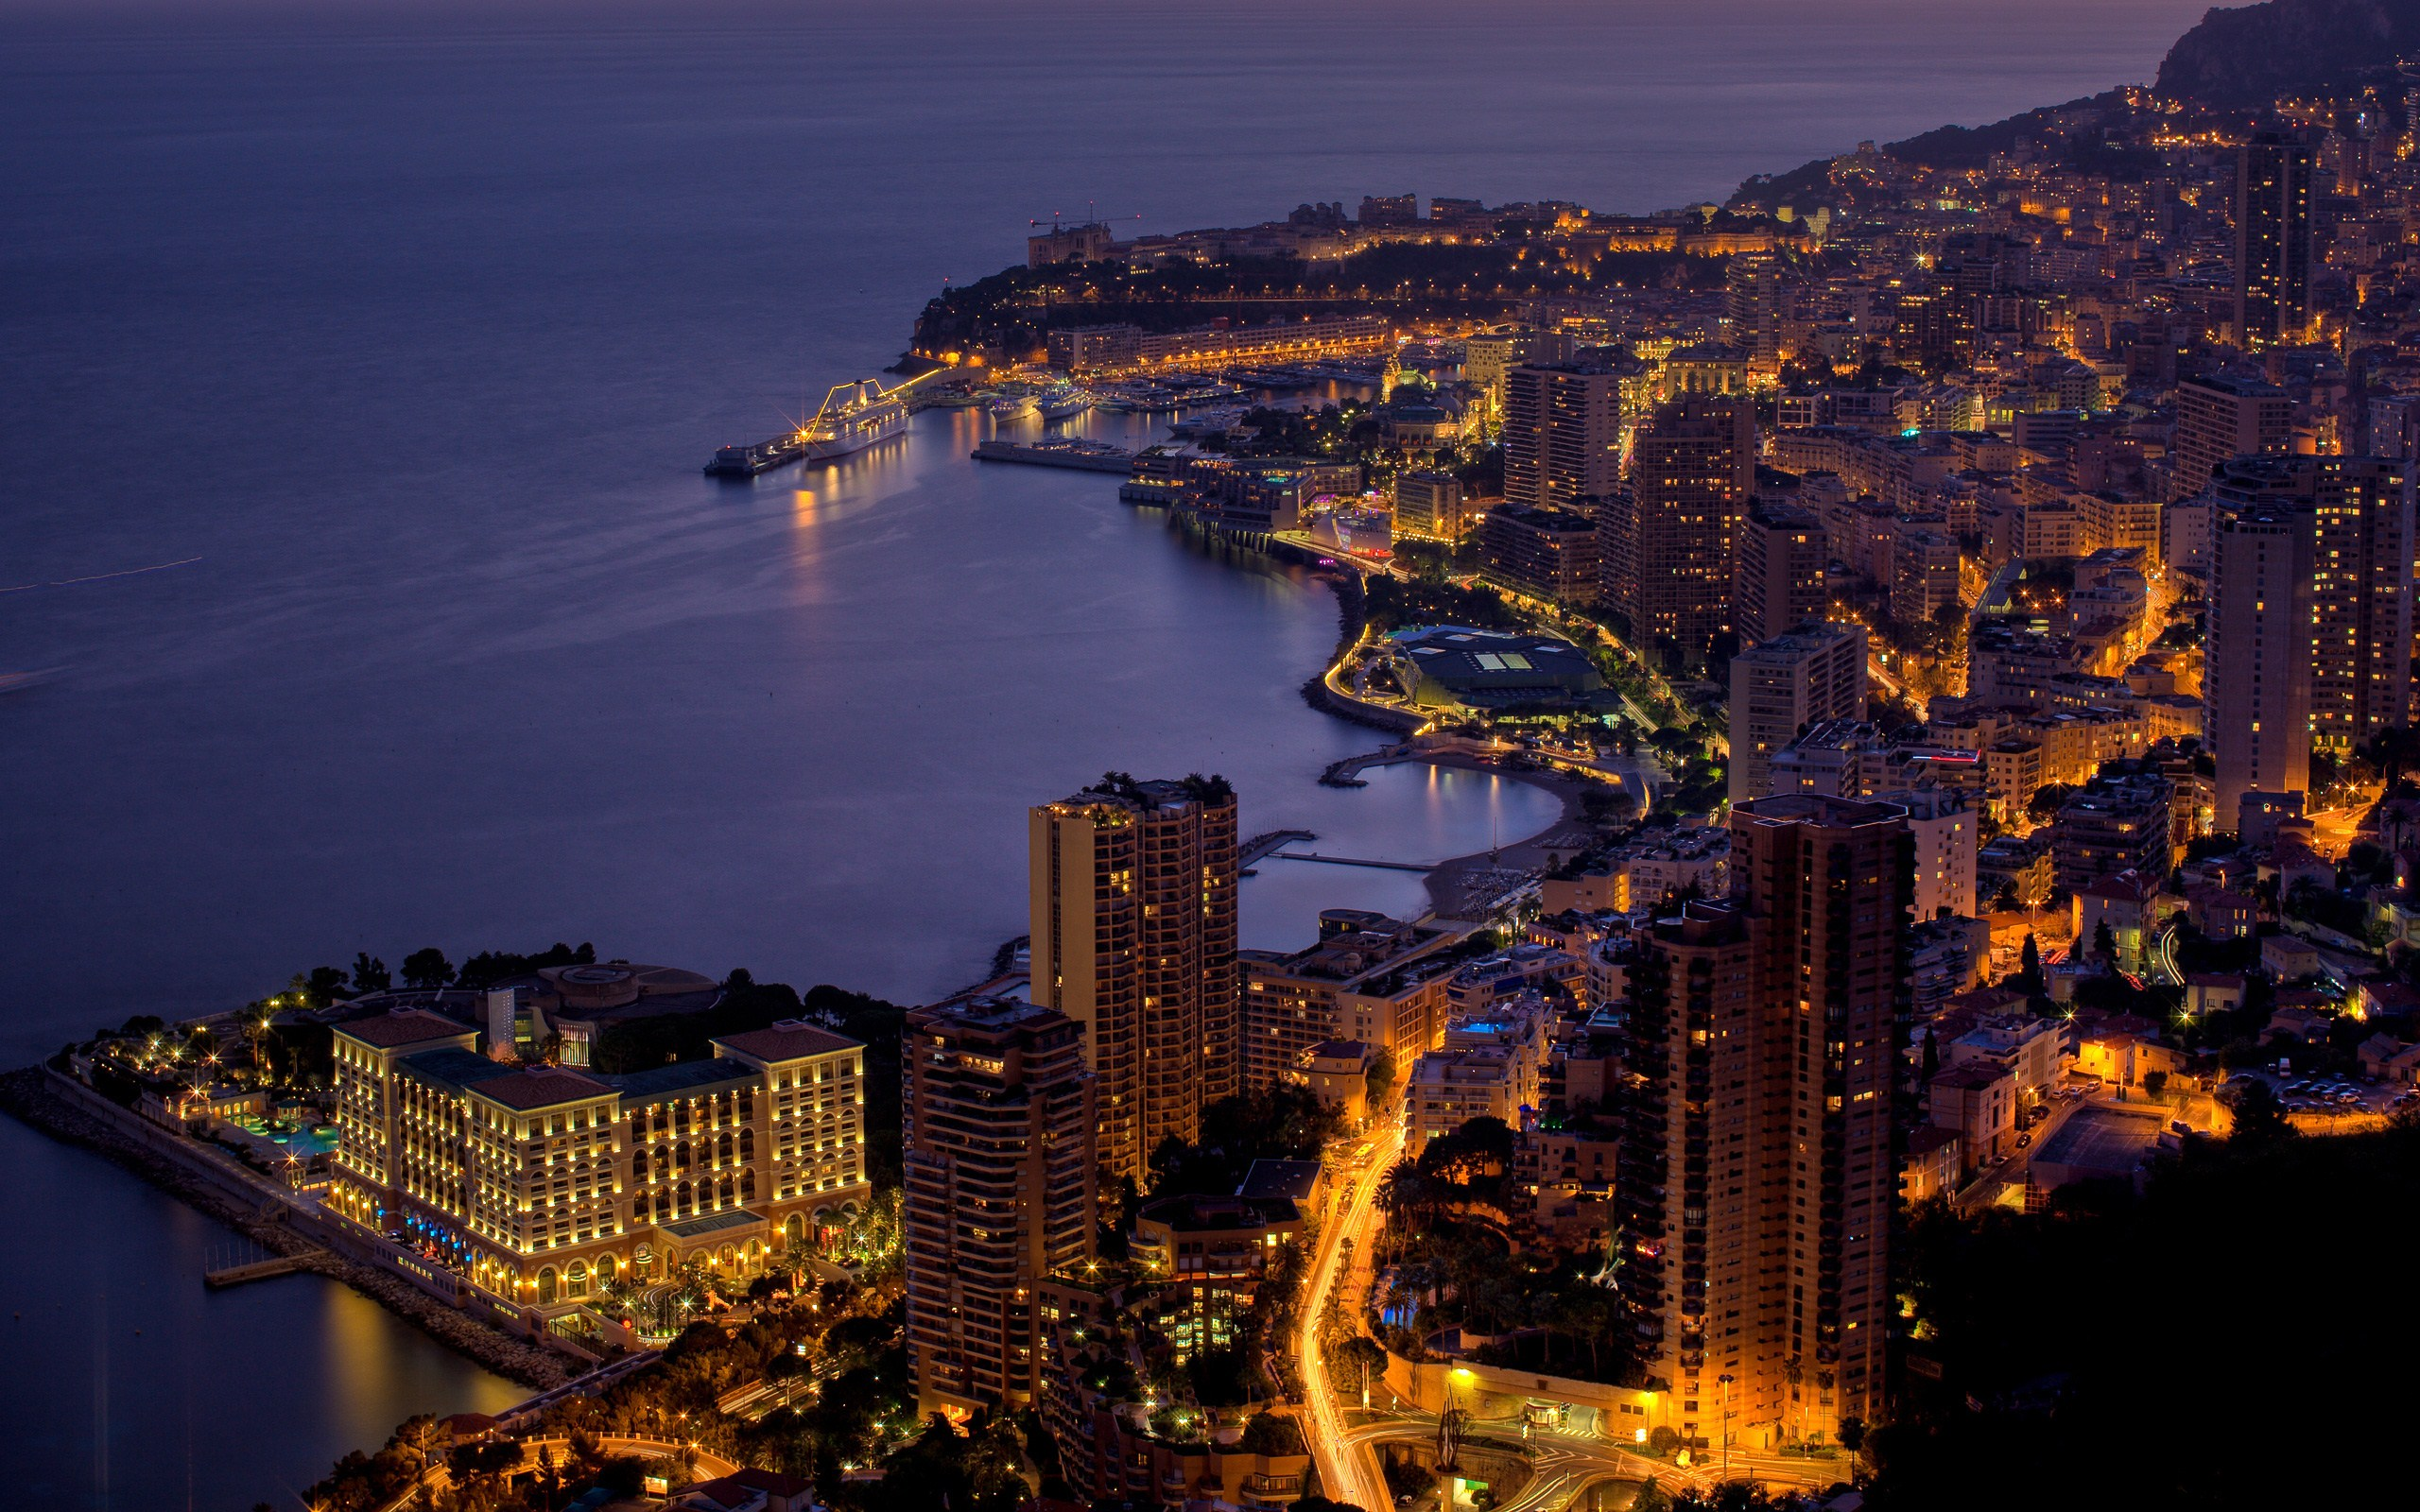 Monaco Night Full HD Wallpaper And Background Image